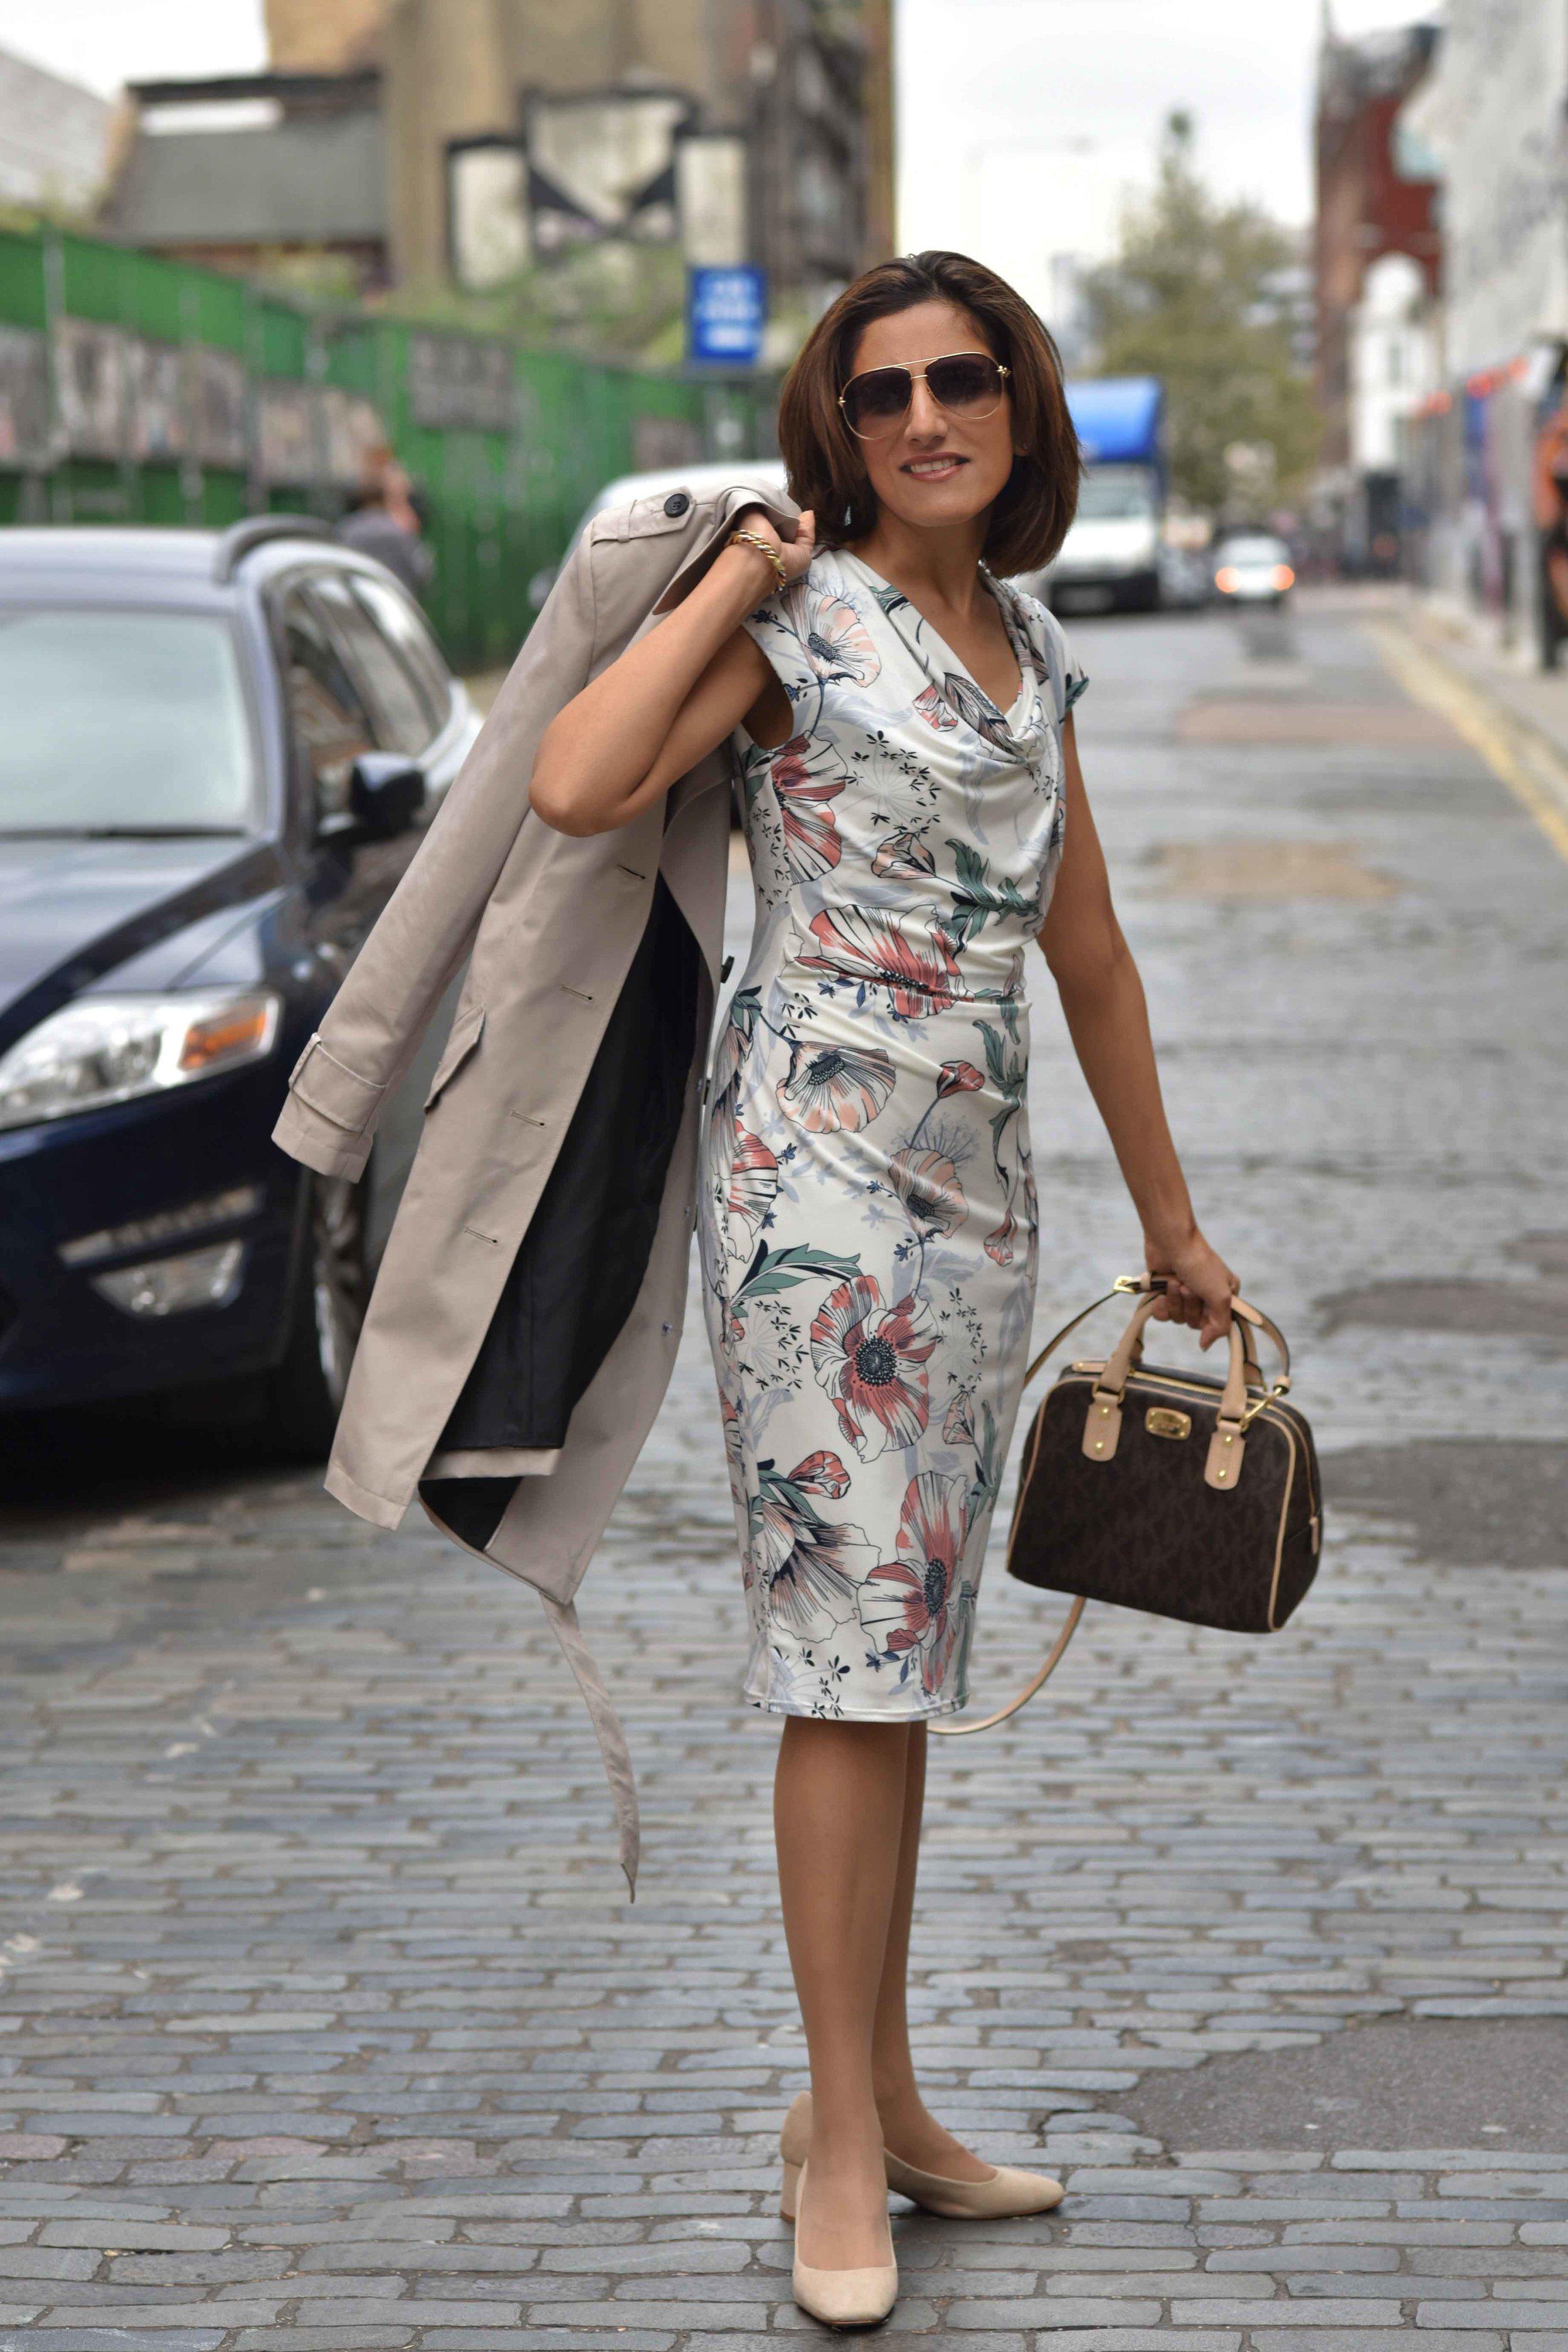 Marks and Spencer shift dress, Marks and Spencer trench, Gucci sunglasses, Michael Kors handbag, Zara sandals, street fashion, Shoreditch, London, U.K. Photo: Nina Shaw, Image©sourcingstyle.com